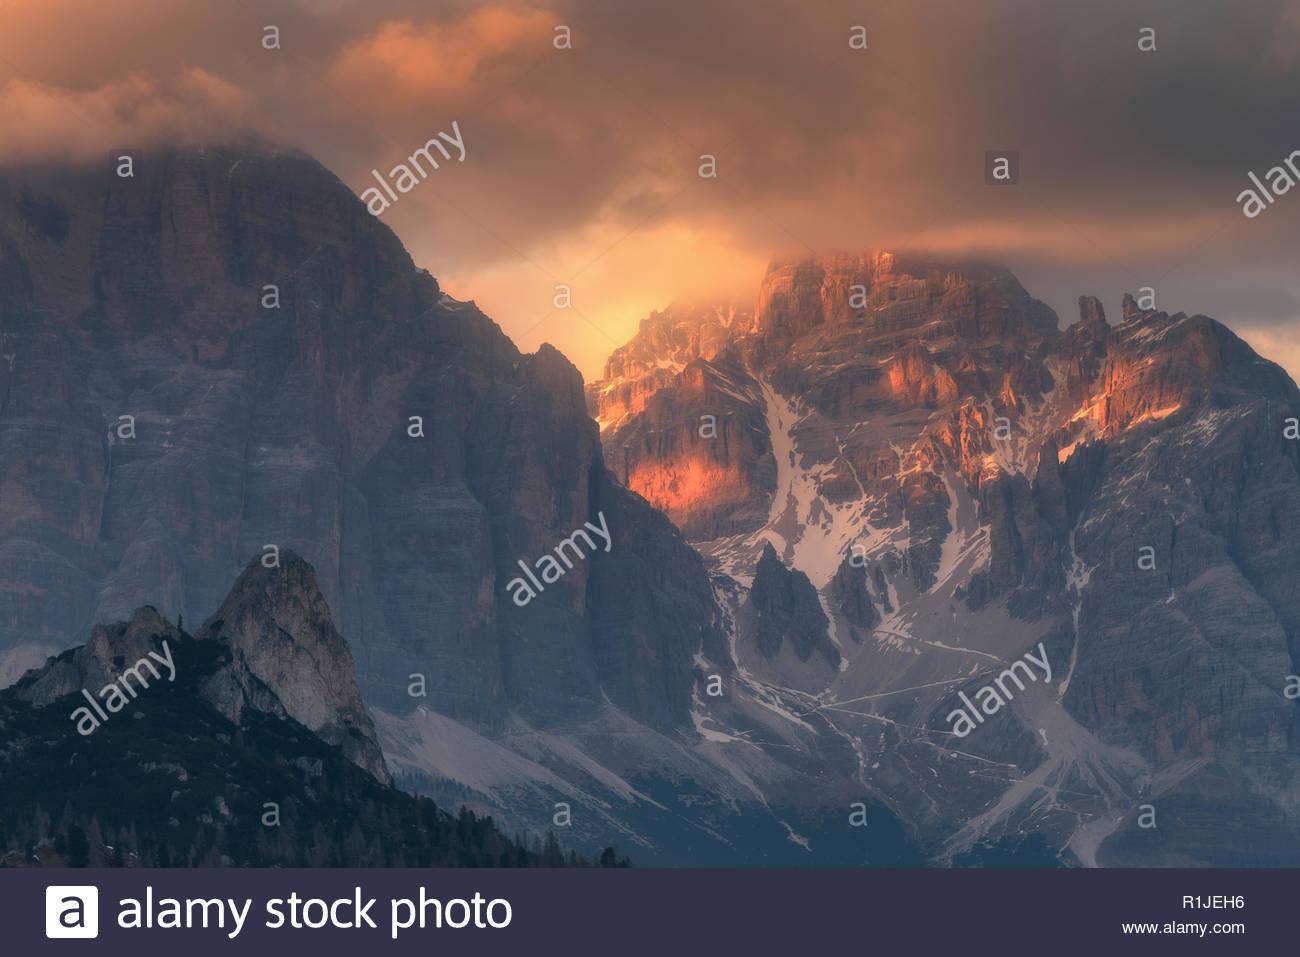 Alpine glow at Passo di Giau in the Dolomites, district of Belluno, Italia, Europe - Stock Image